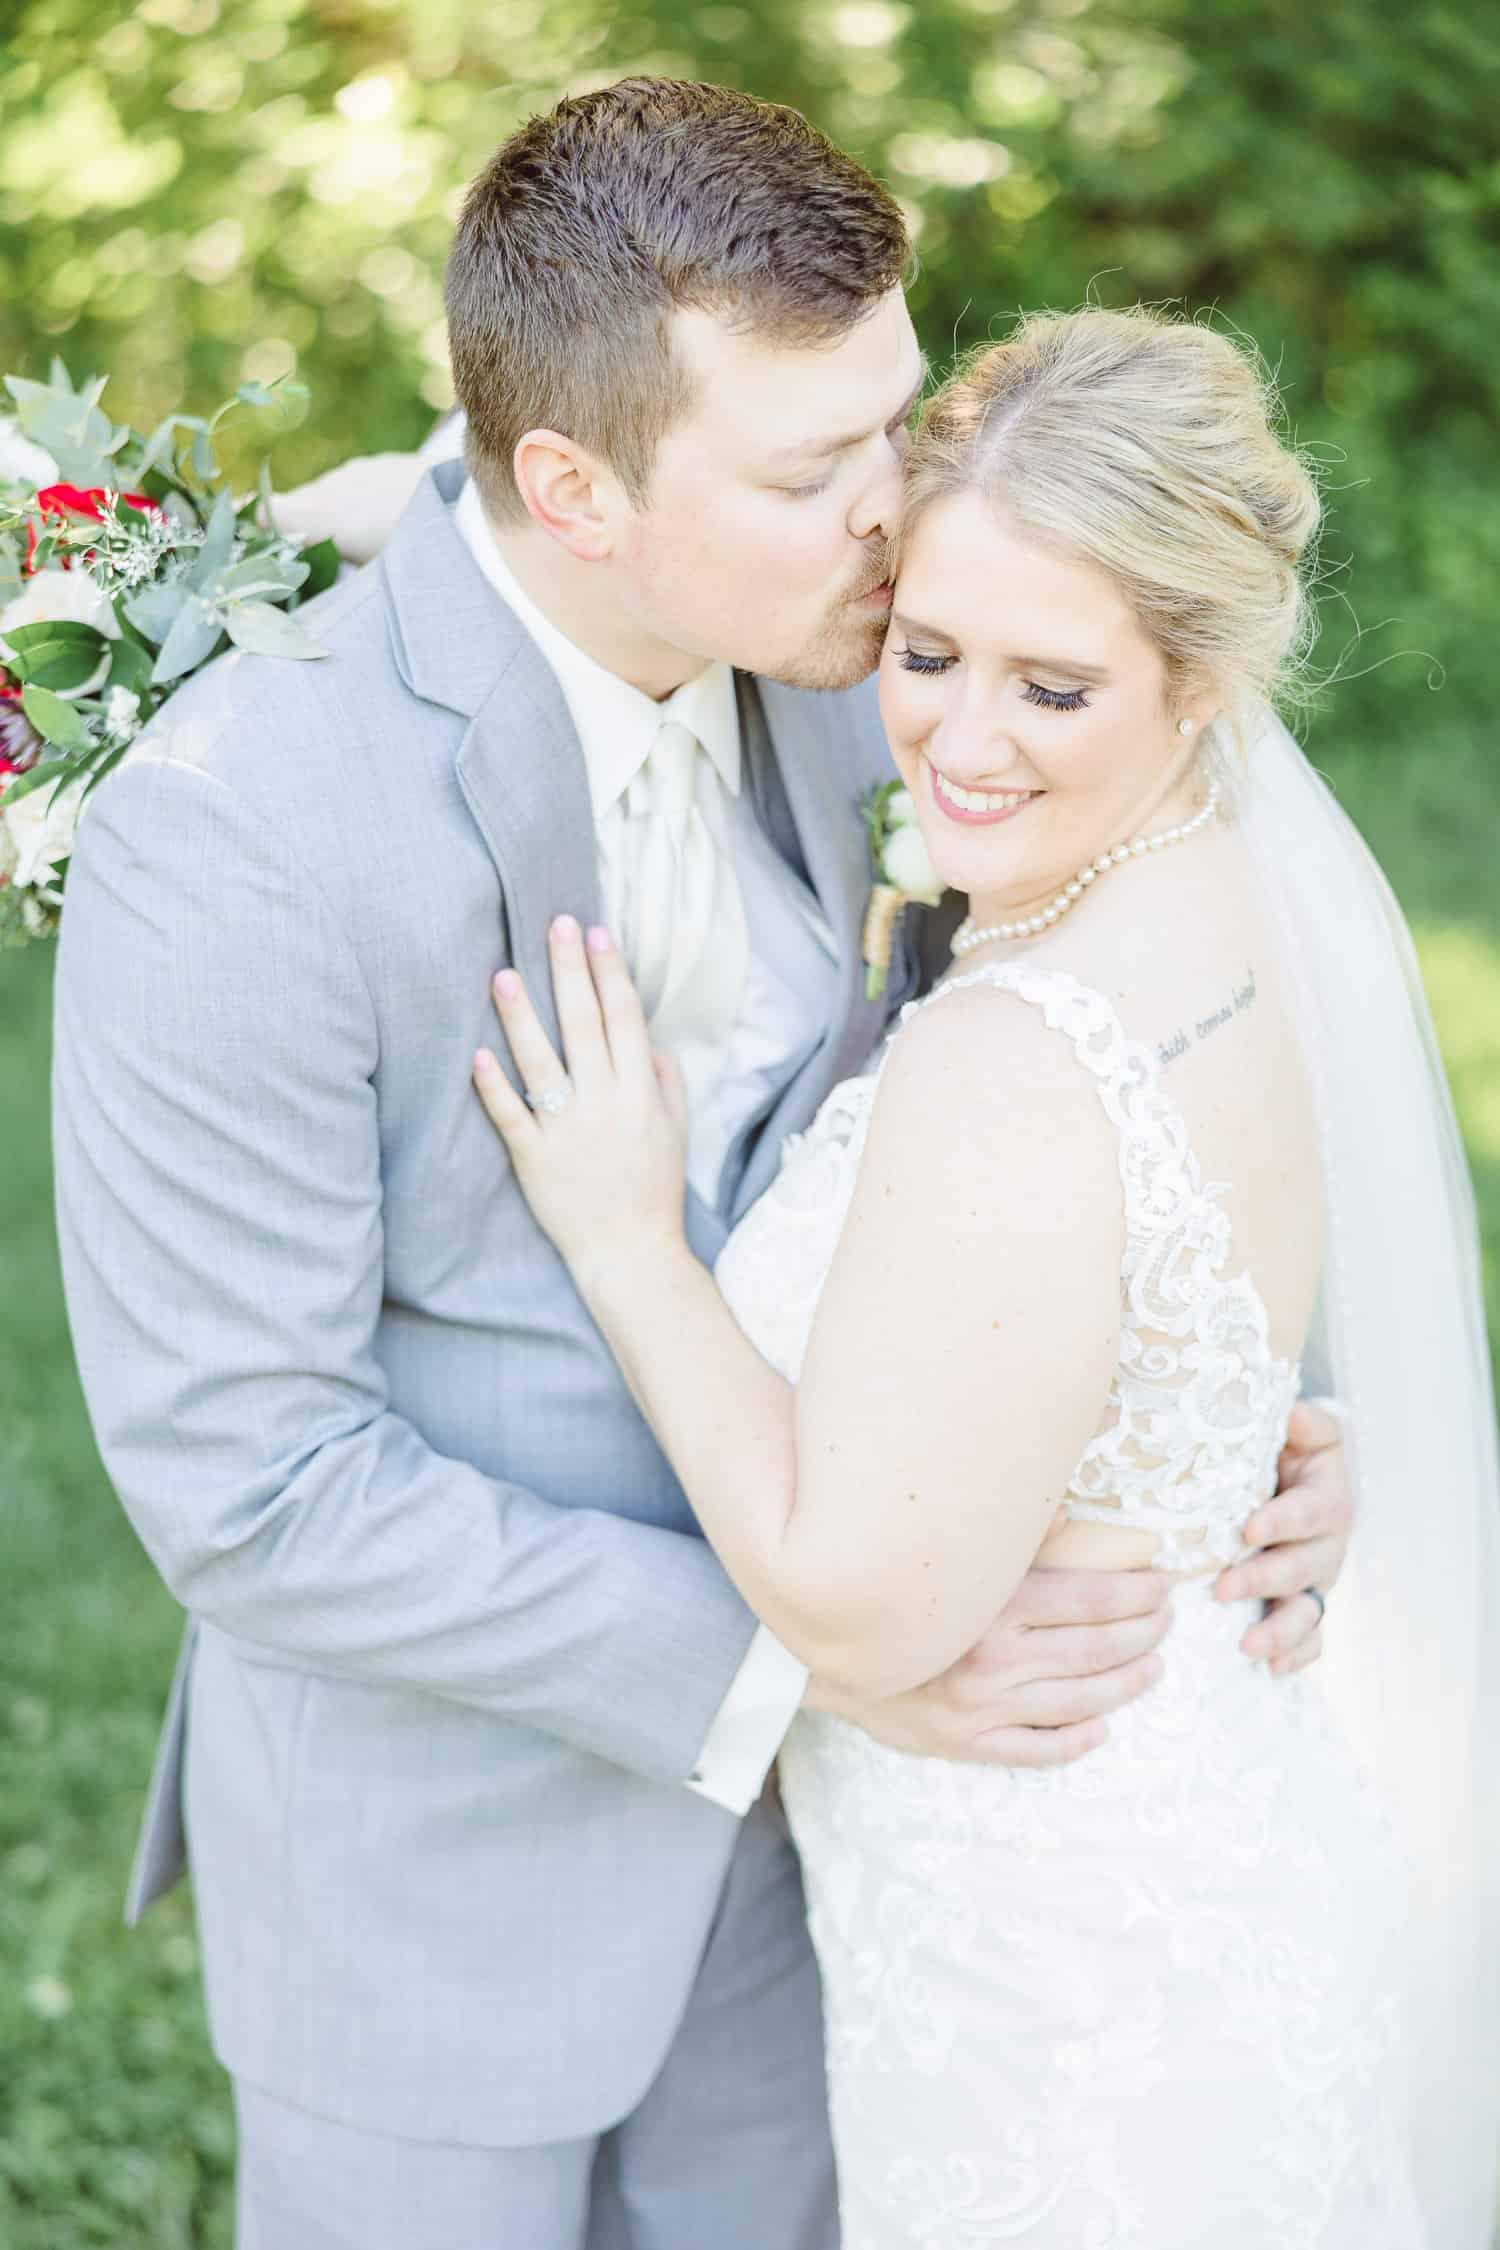 Bride and groom photos at Faulkner's Ranch in Kansas City